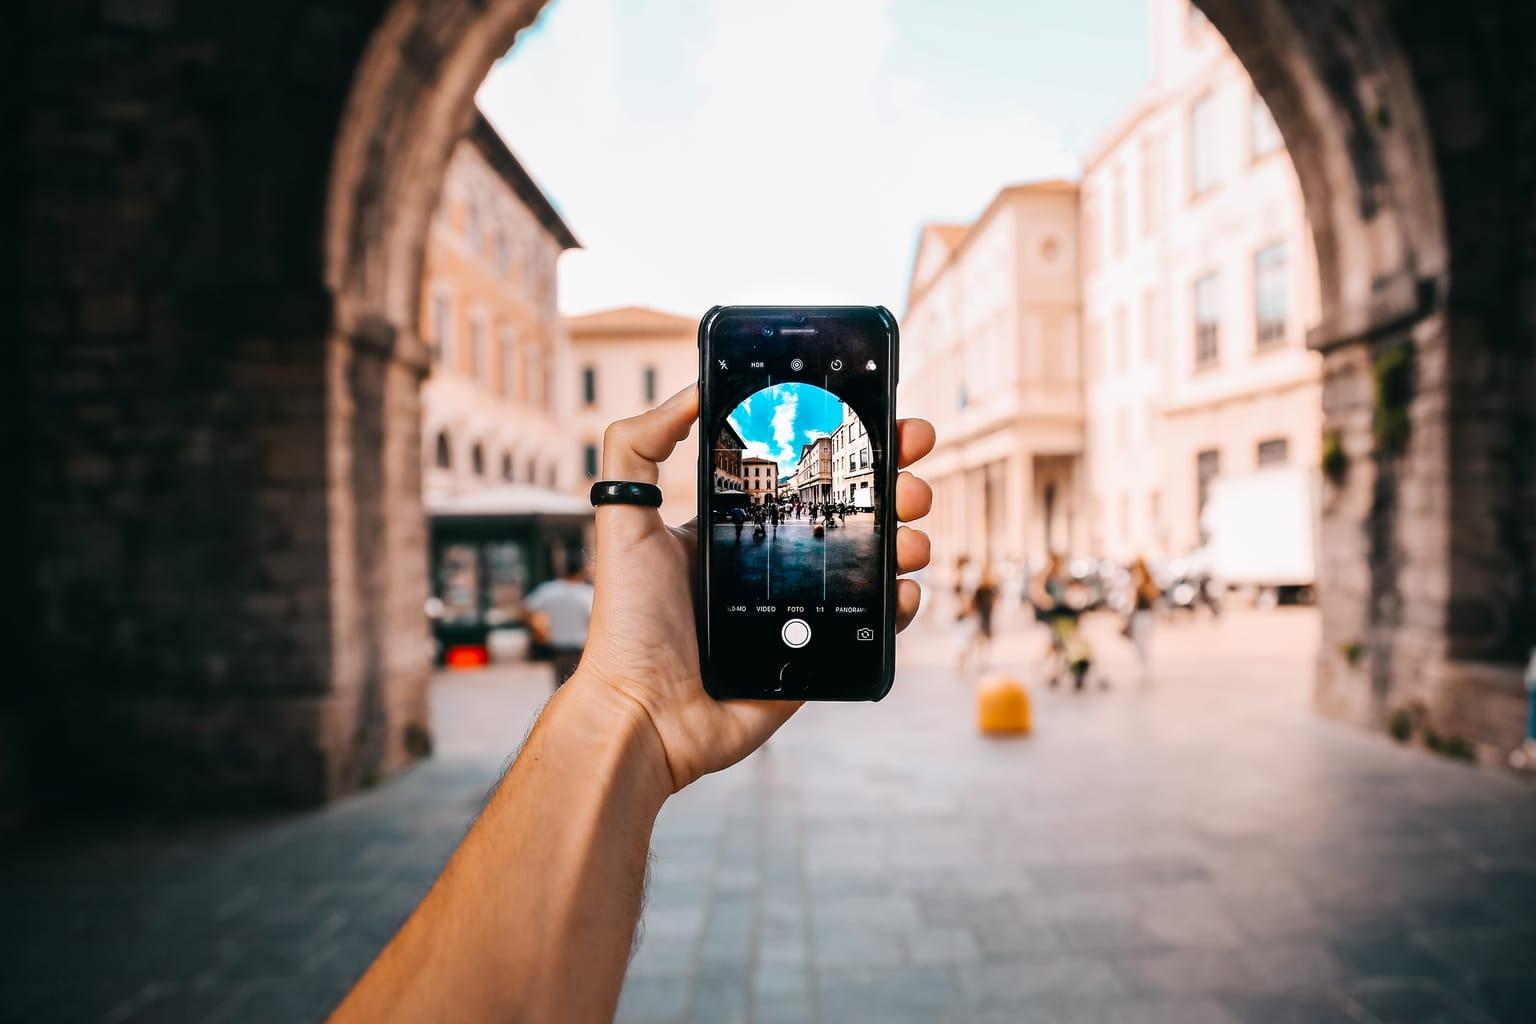 curso de fotografia con celular